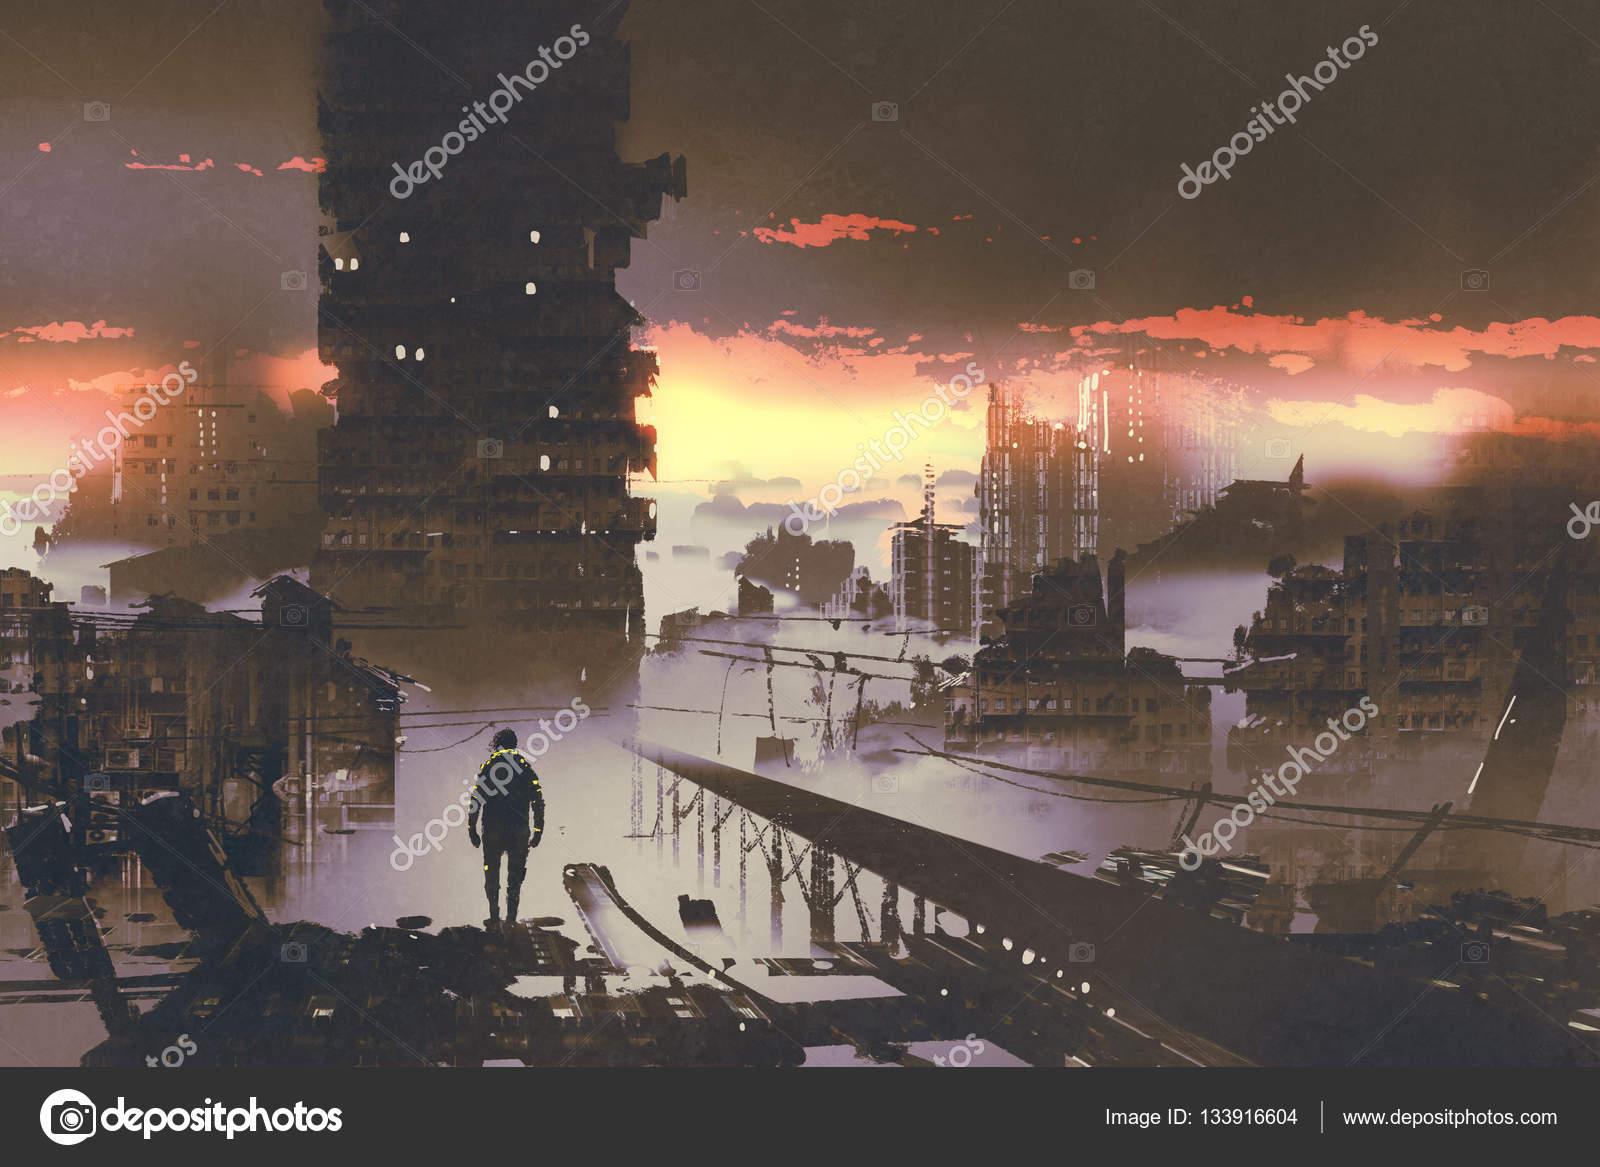 Áˆ Apocalyptic Cityscape Stock Photos Royalty Free Apocalypse City Images Download On Depositphotos